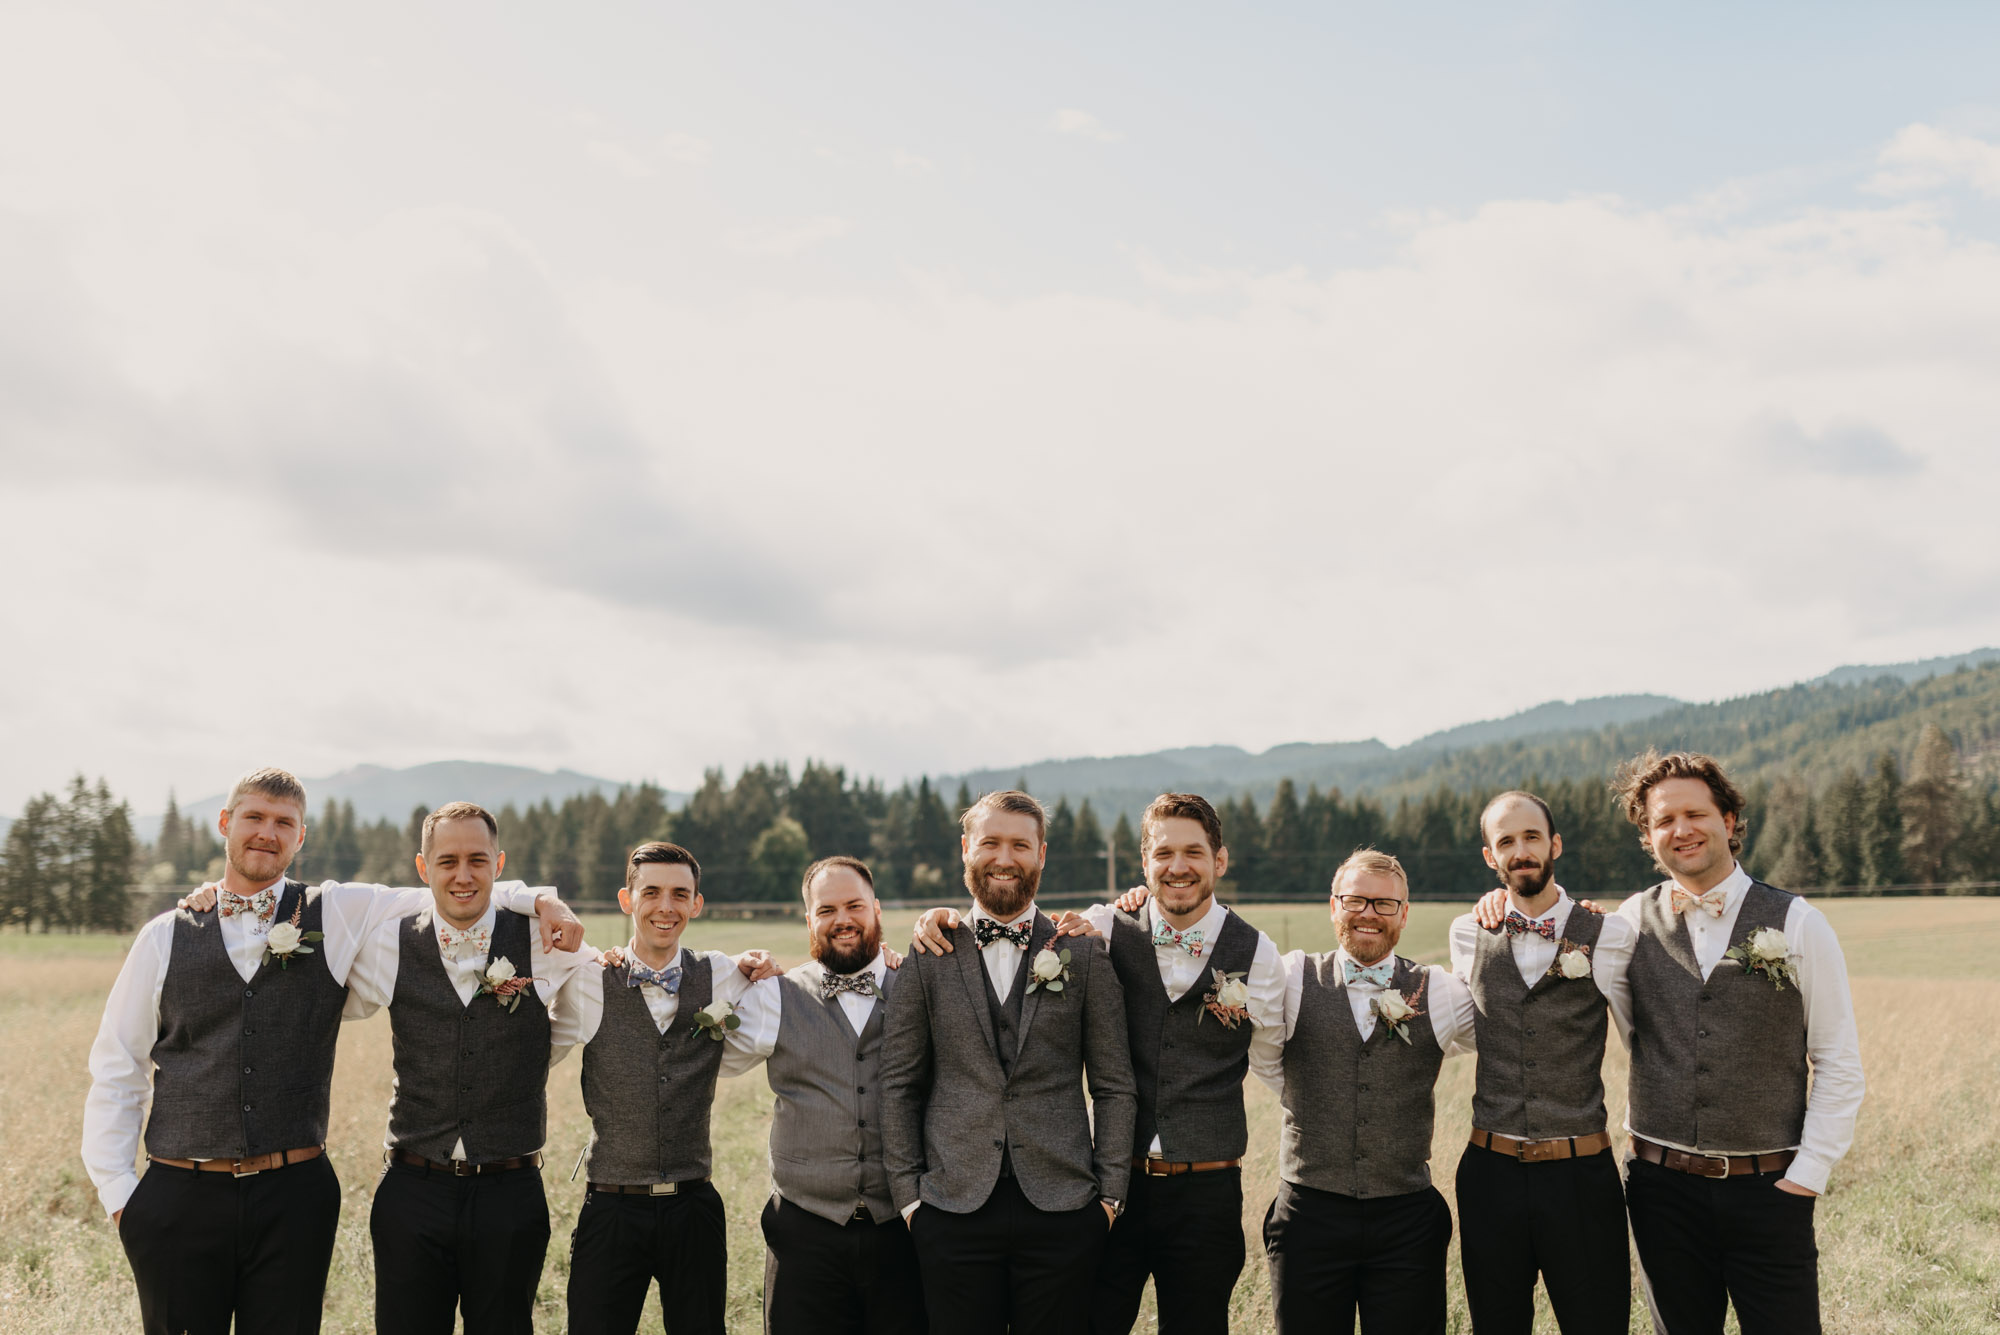 Bridal-Party-Free-People-Flower-Dresses-Washington-Wedding-8407.jpg